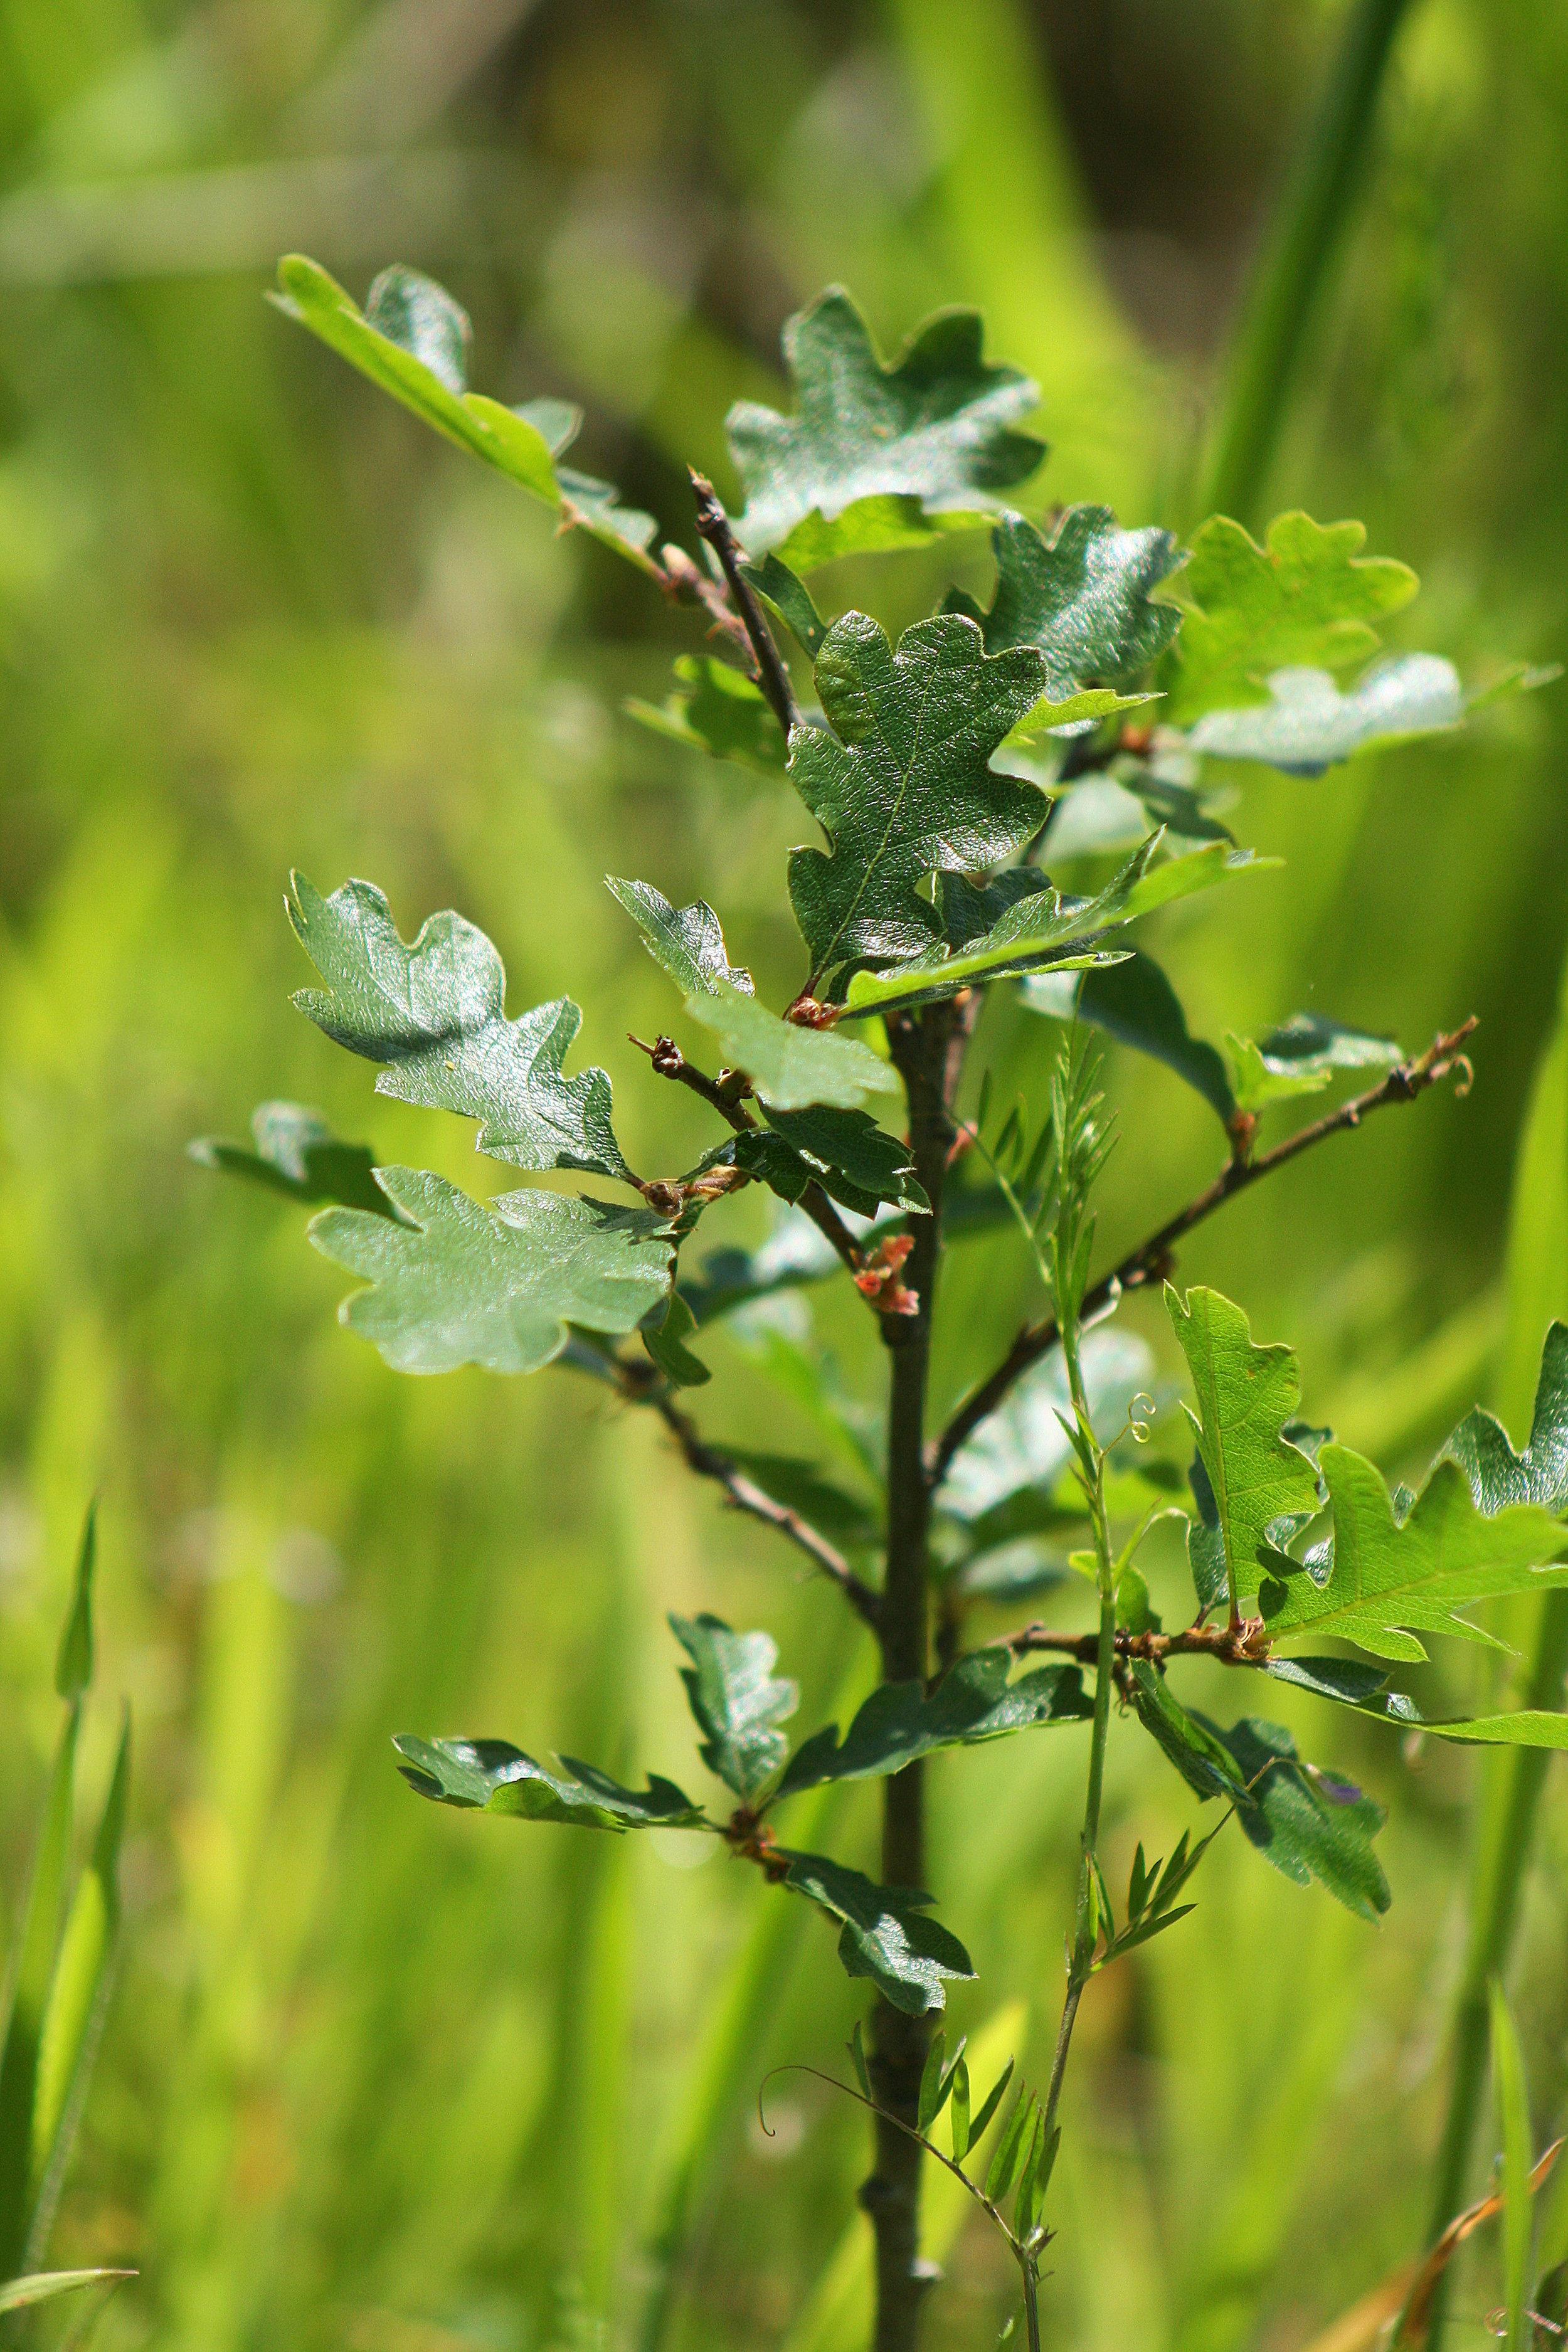 Oregon White Oak seedling